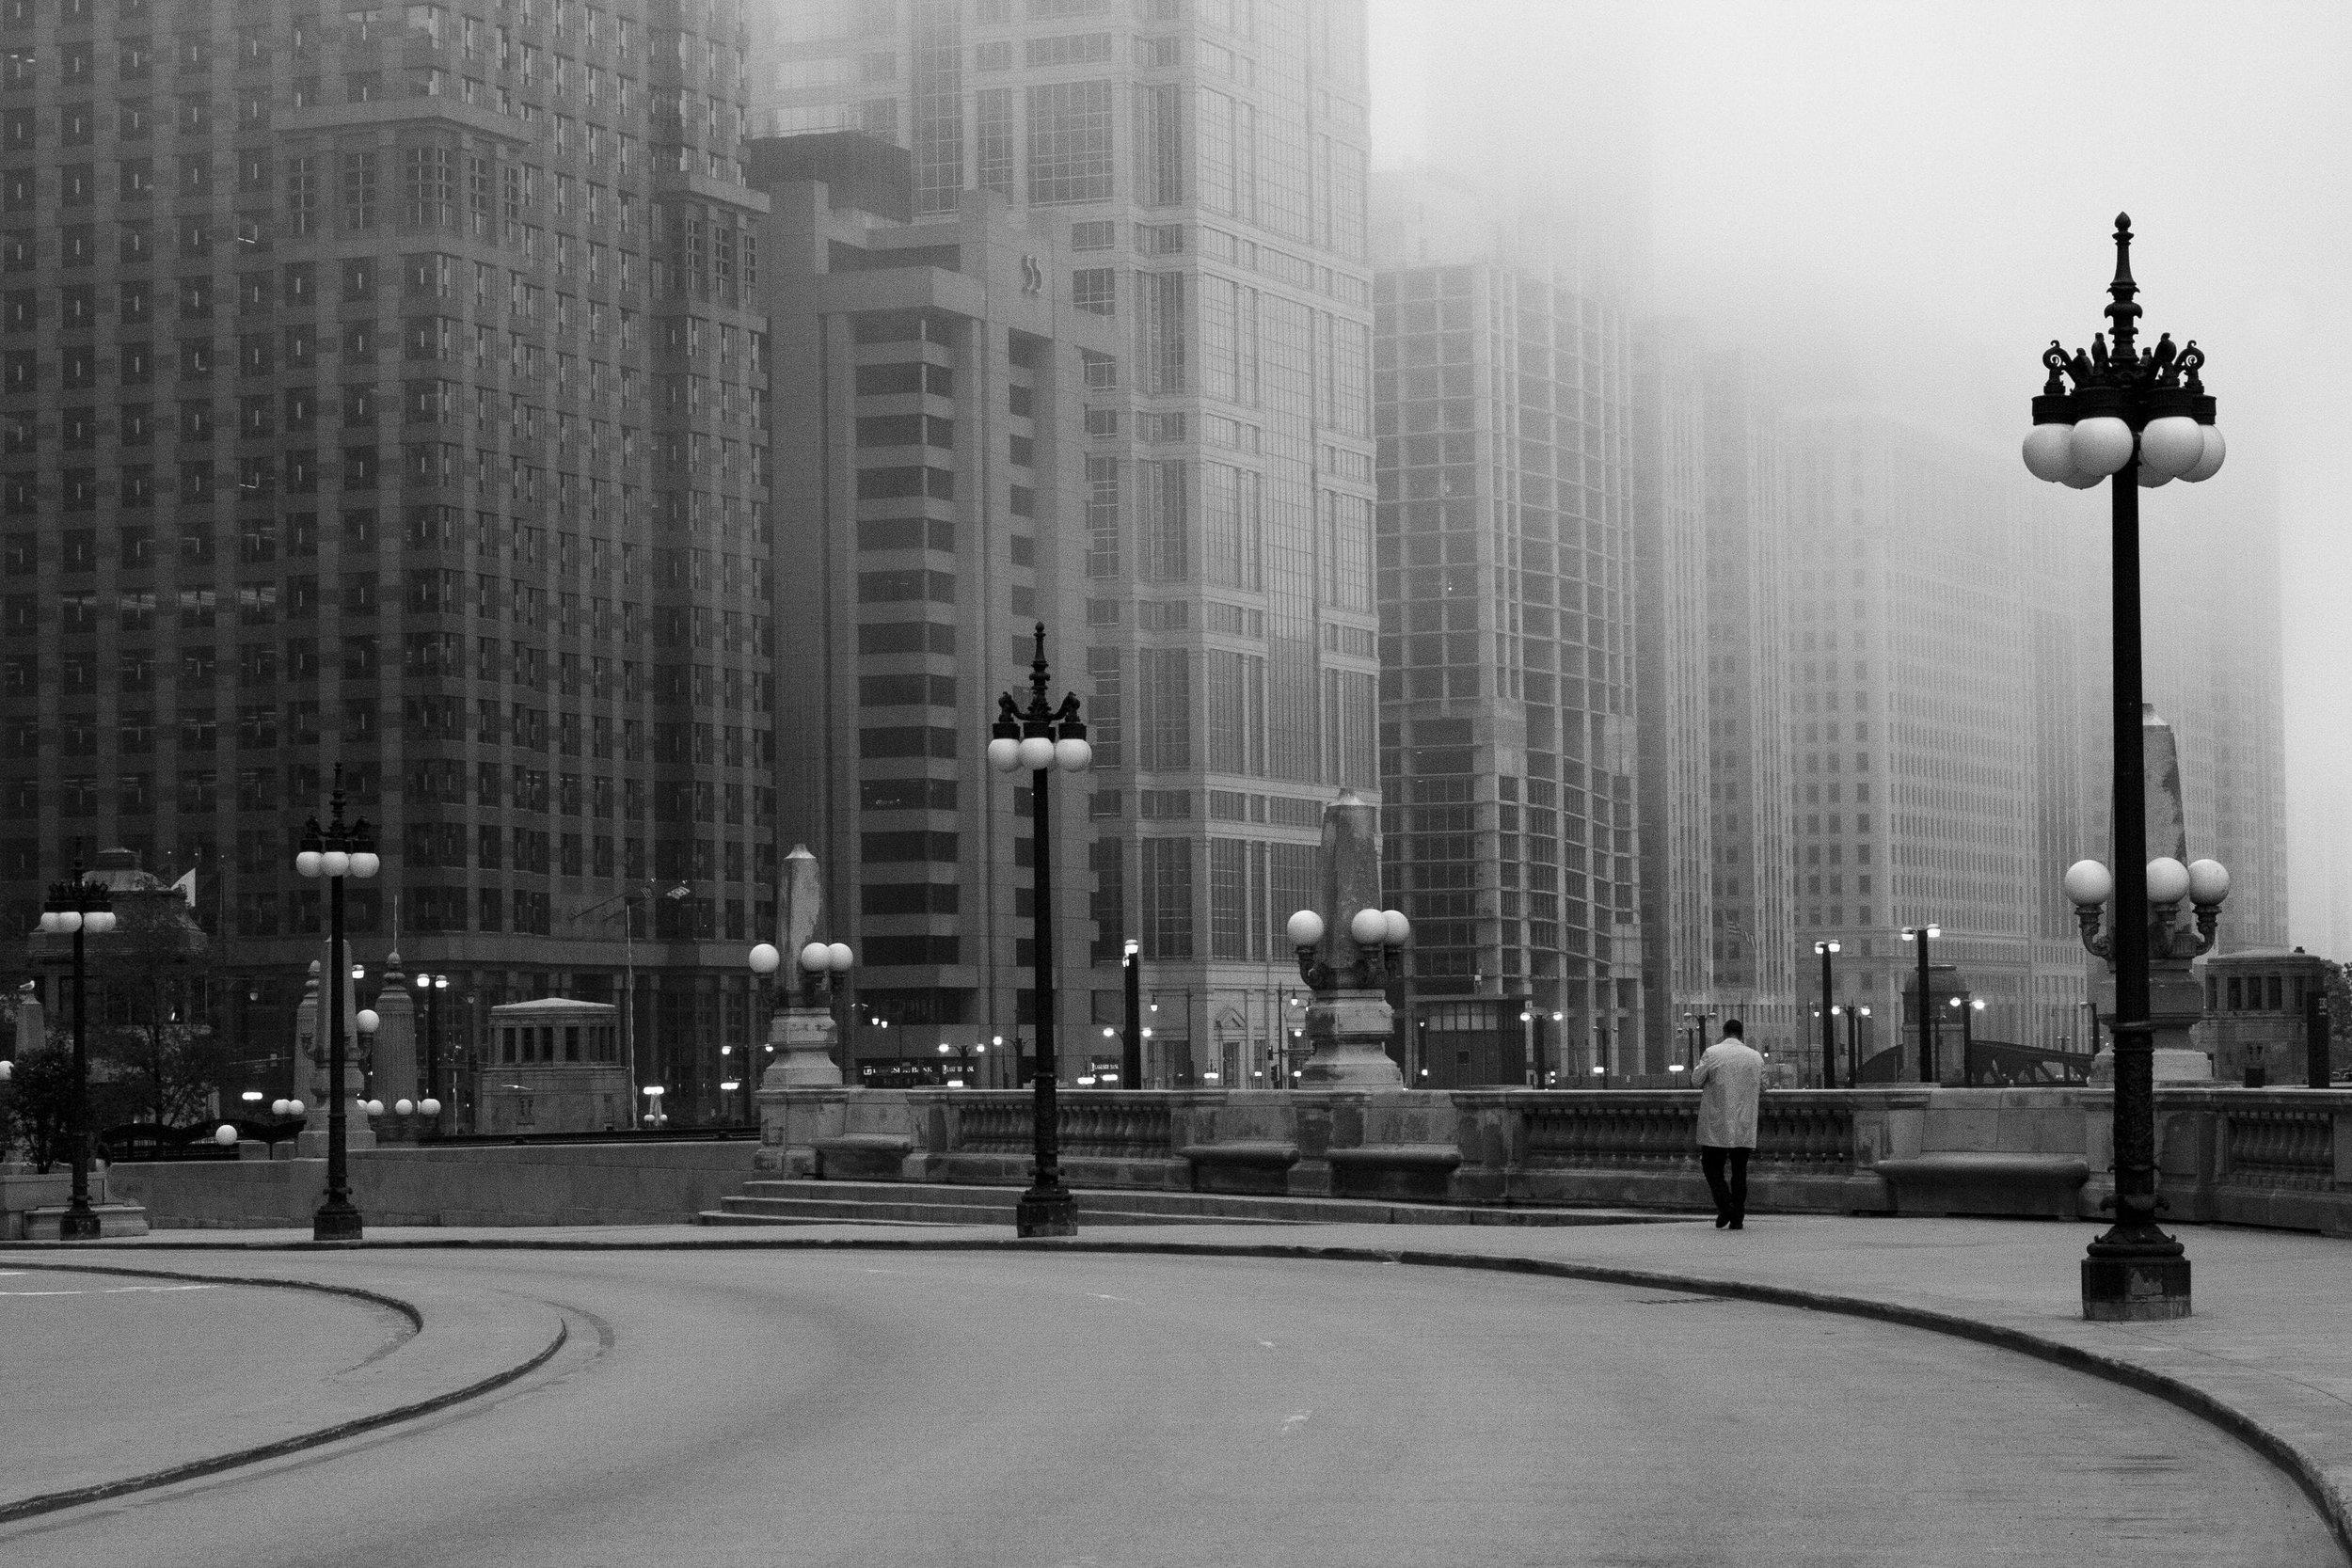 Chicago's Wacker Drive-min.jpg